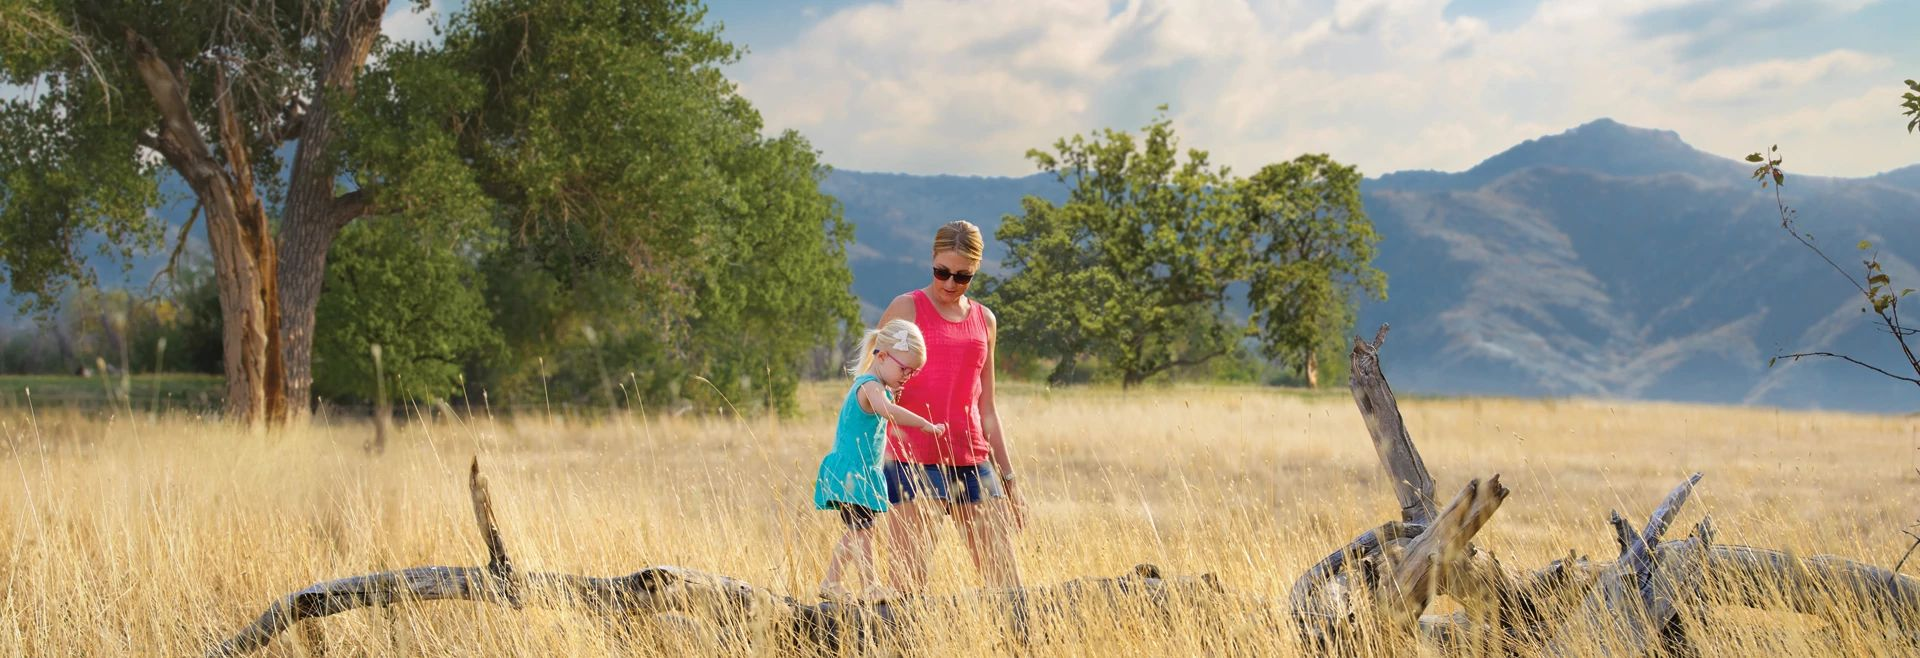 Solstice Summer Lifestyle Mother Child Log